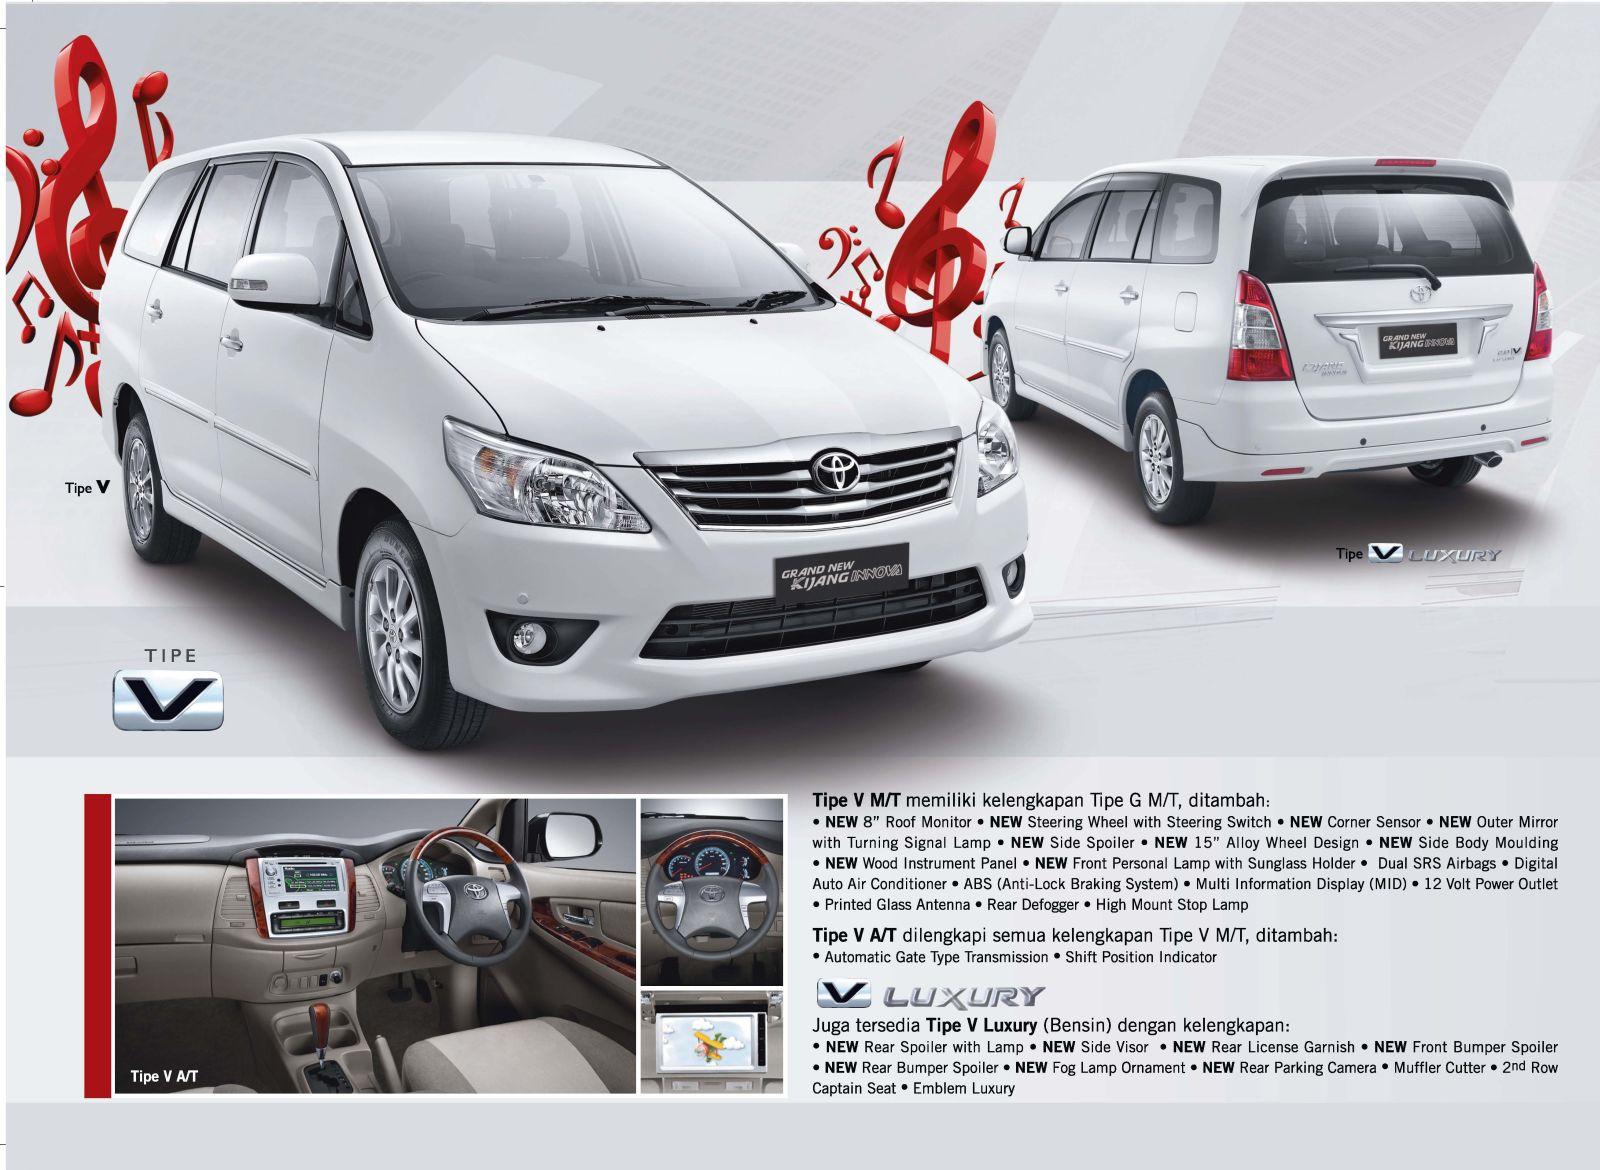 Grand New Kijang Innova Spesifikasi All Venturer Brosur Pesta Diskon Toyota